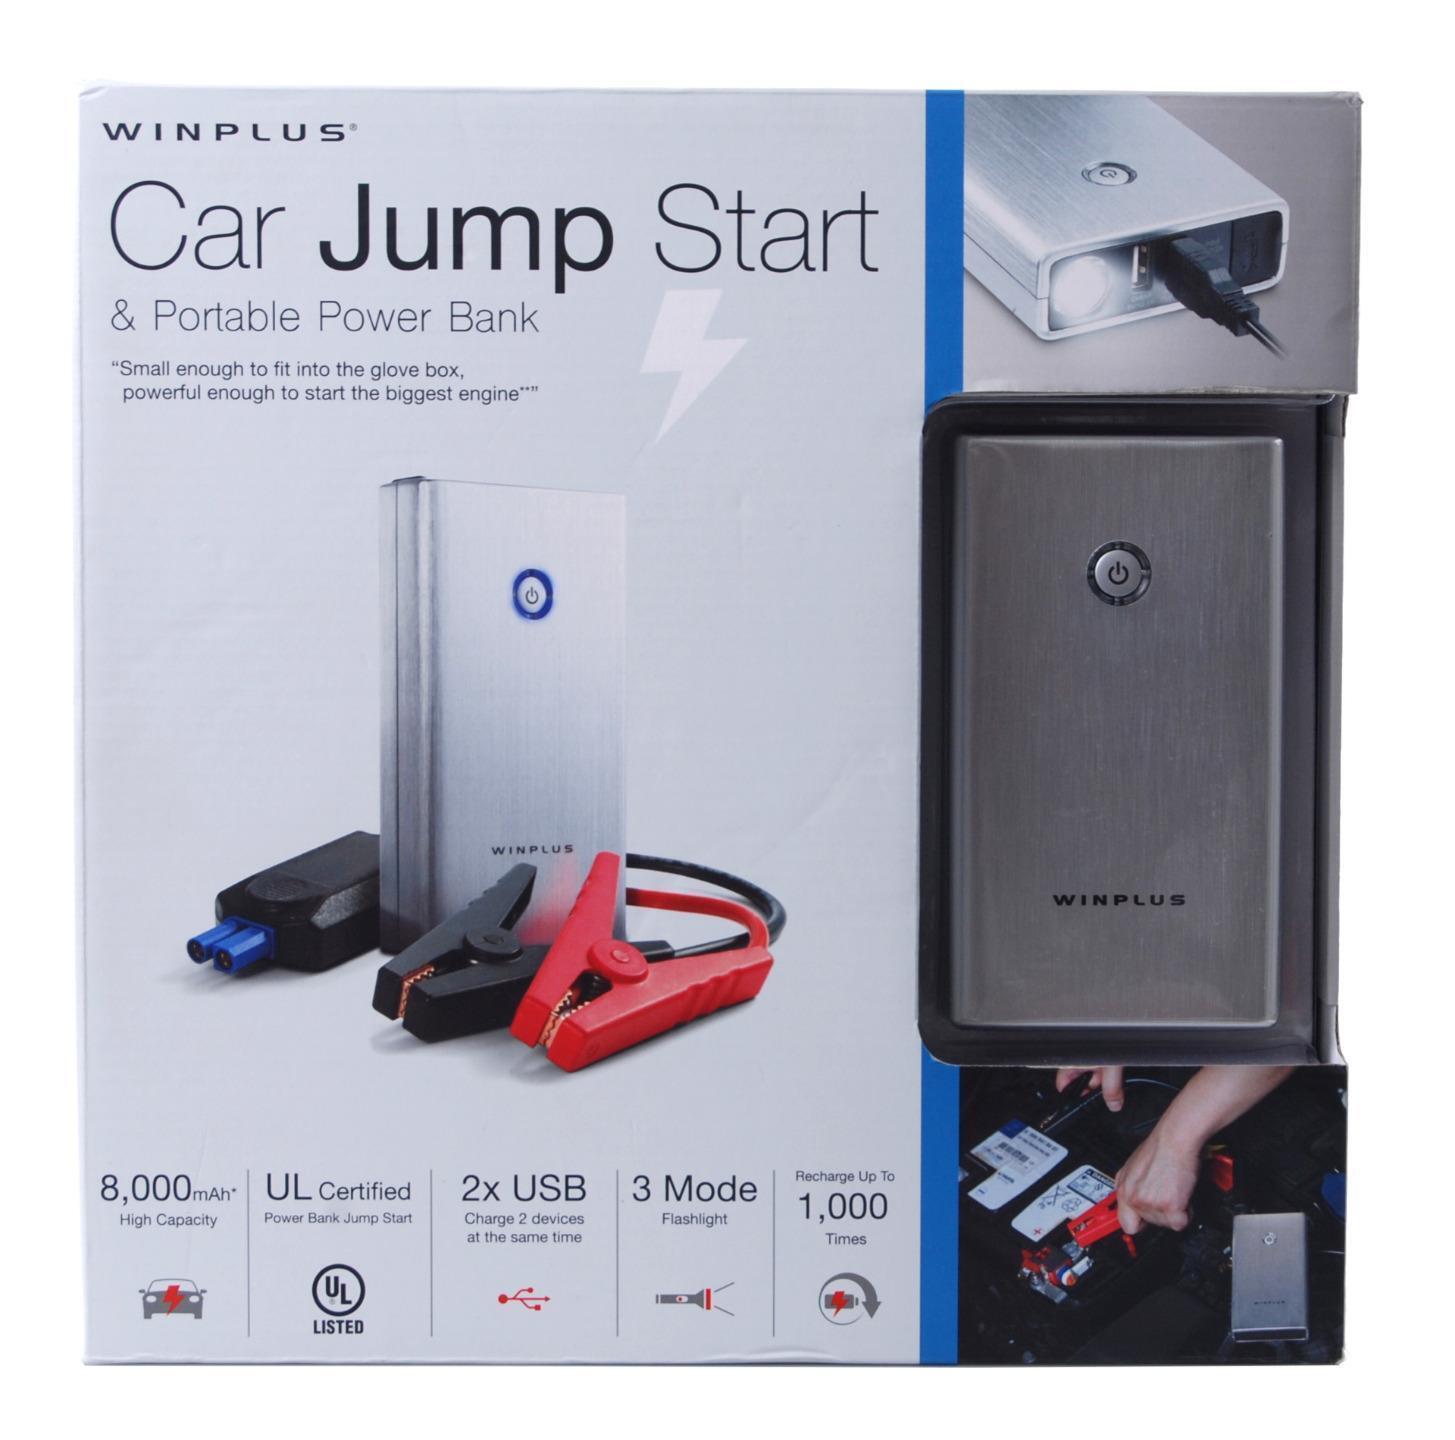 Image Result For Winplus Car Jump Start